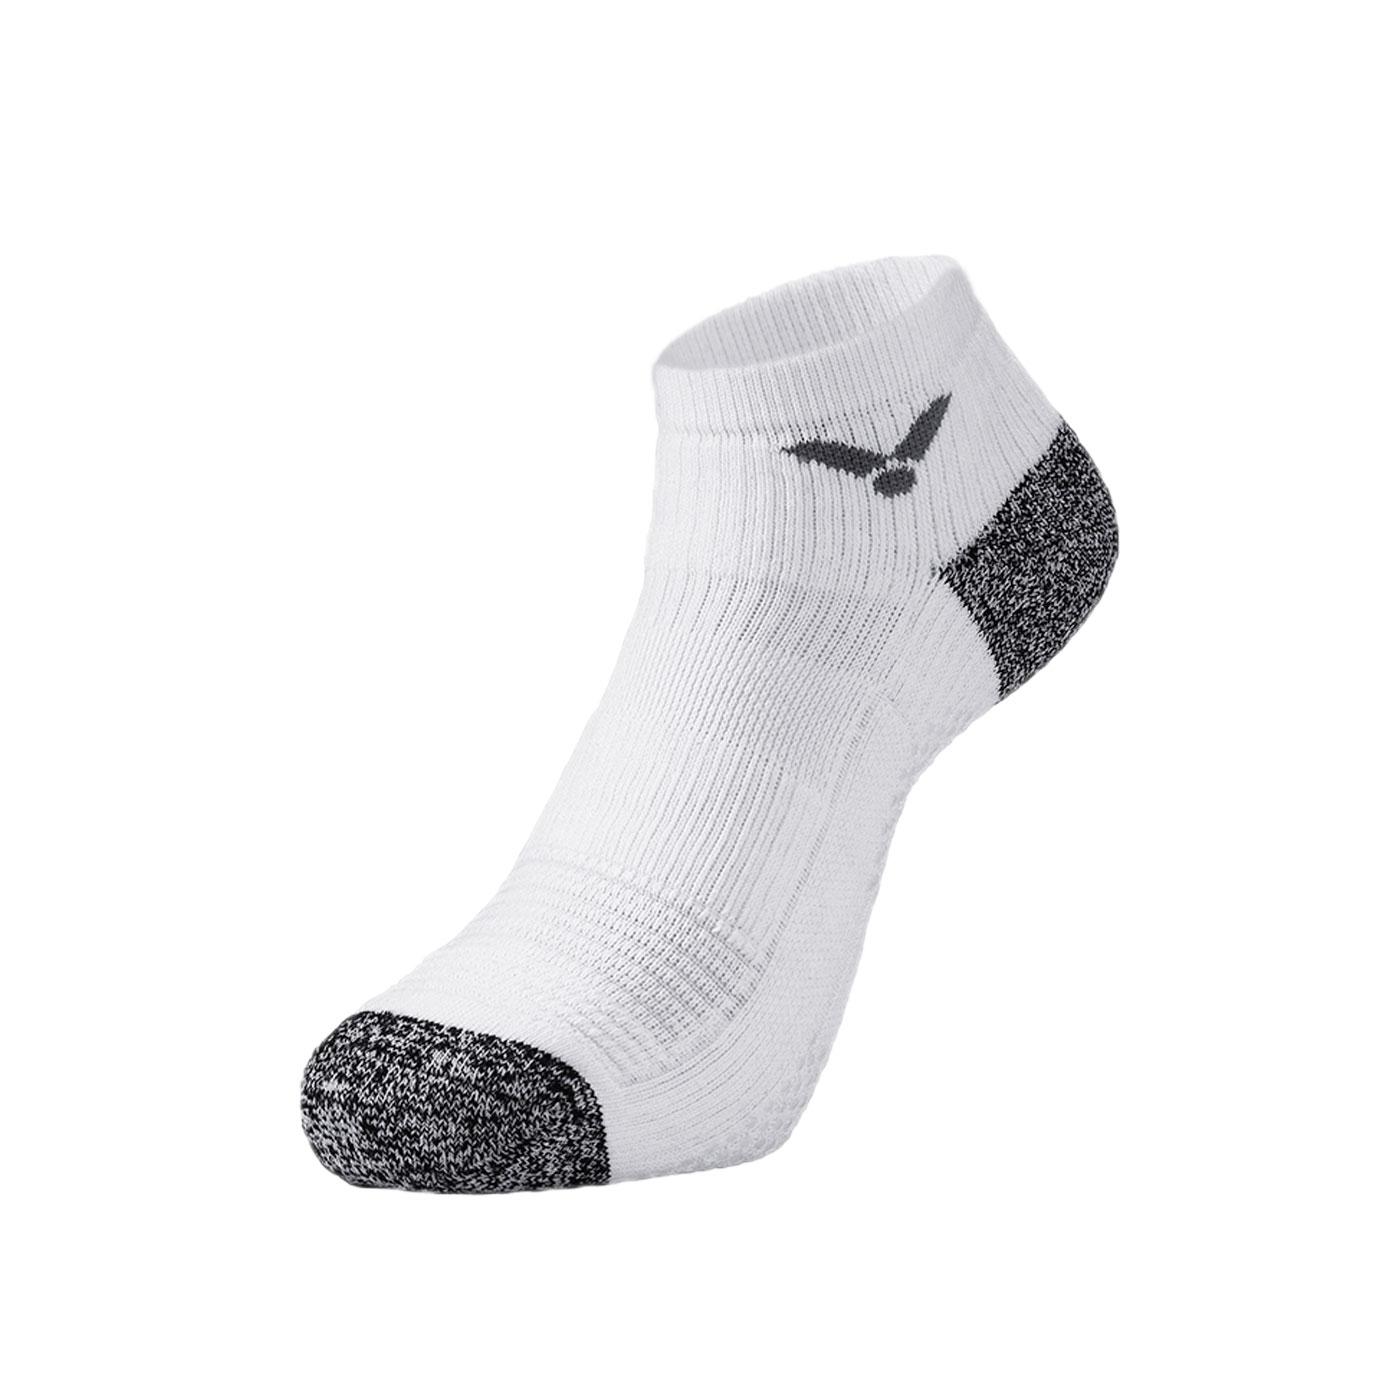 VICTOR 抗菌消臭機能襪 C-5074A - 白灰黑